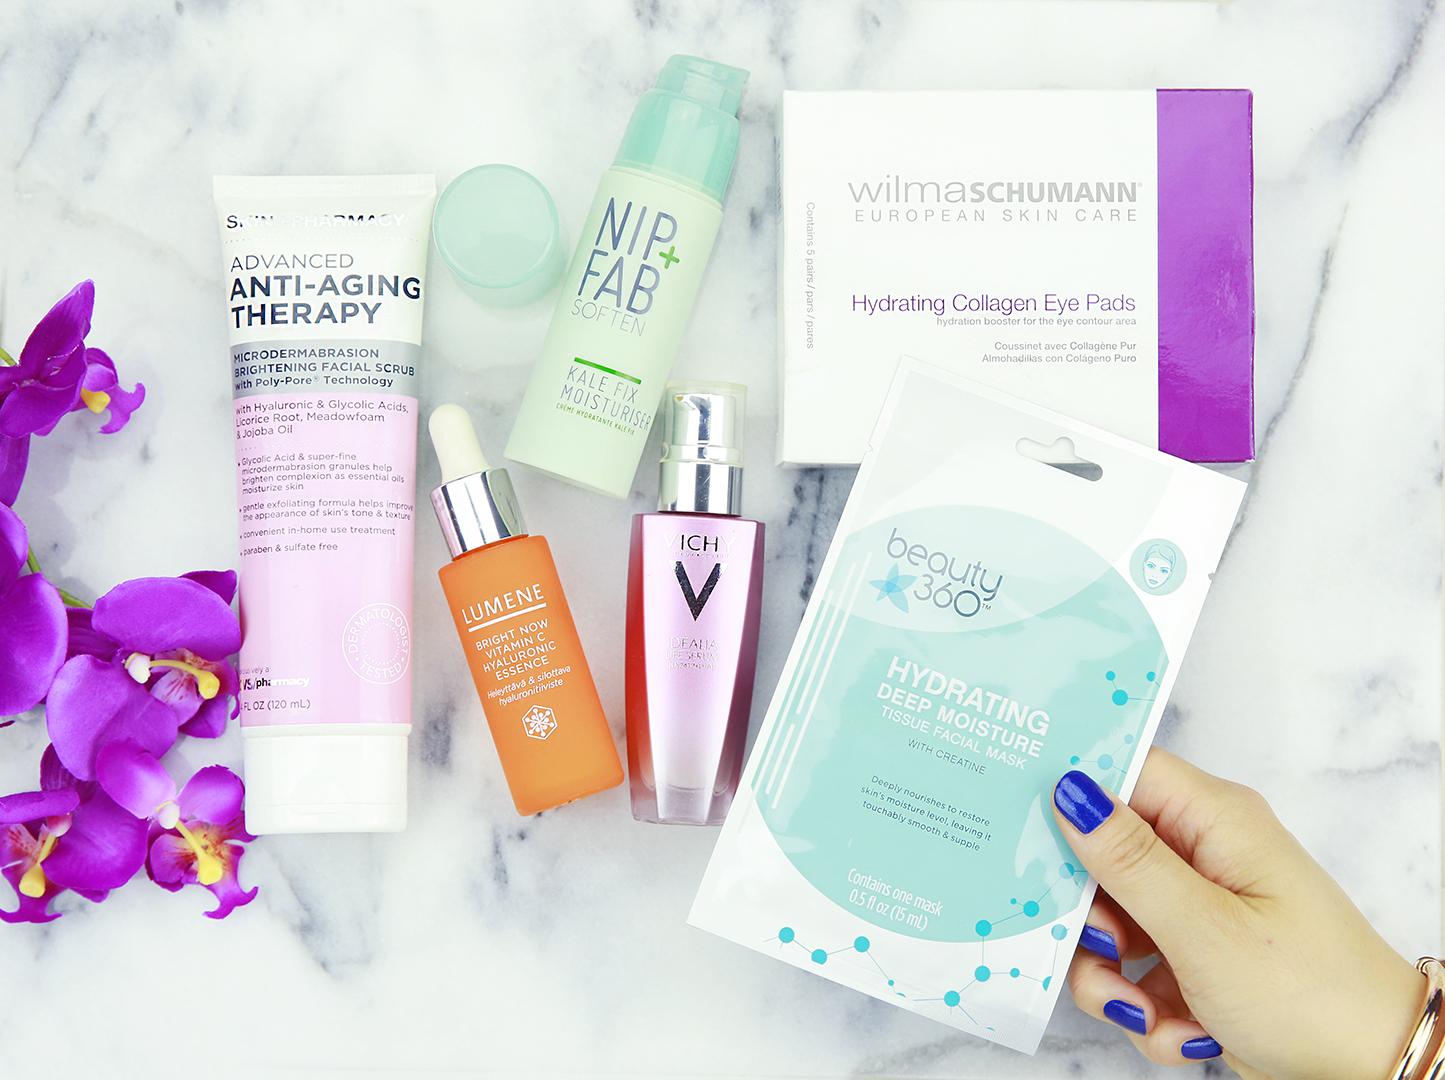 Hautepinkpretty Specialty Skincare At Cvs